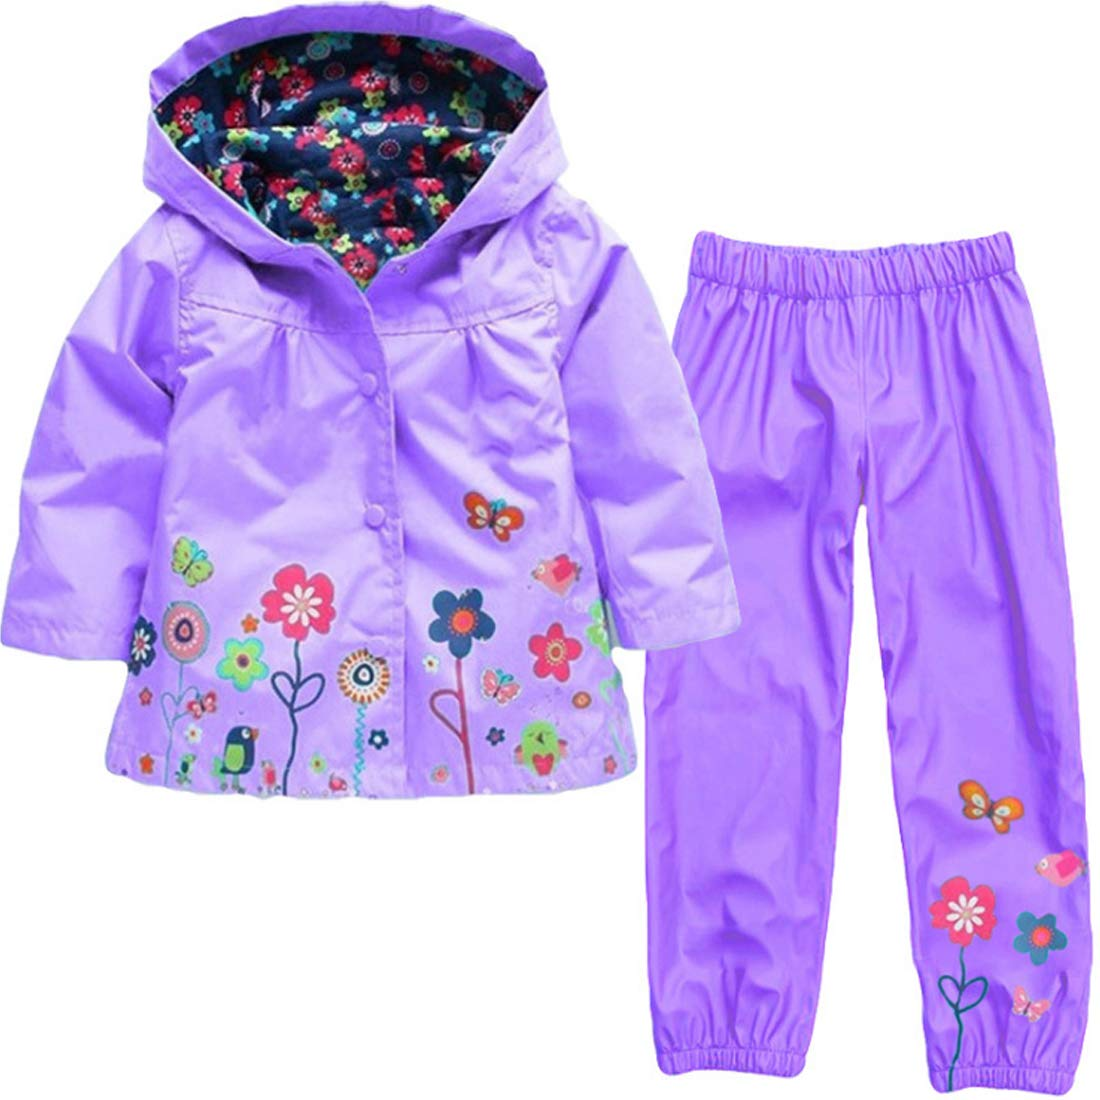 CHETI Im Pickle Rick Newborn Infant Toddler Baby Girls Boys Bodysuit Short Sleeve 0-24 MonthsBlack